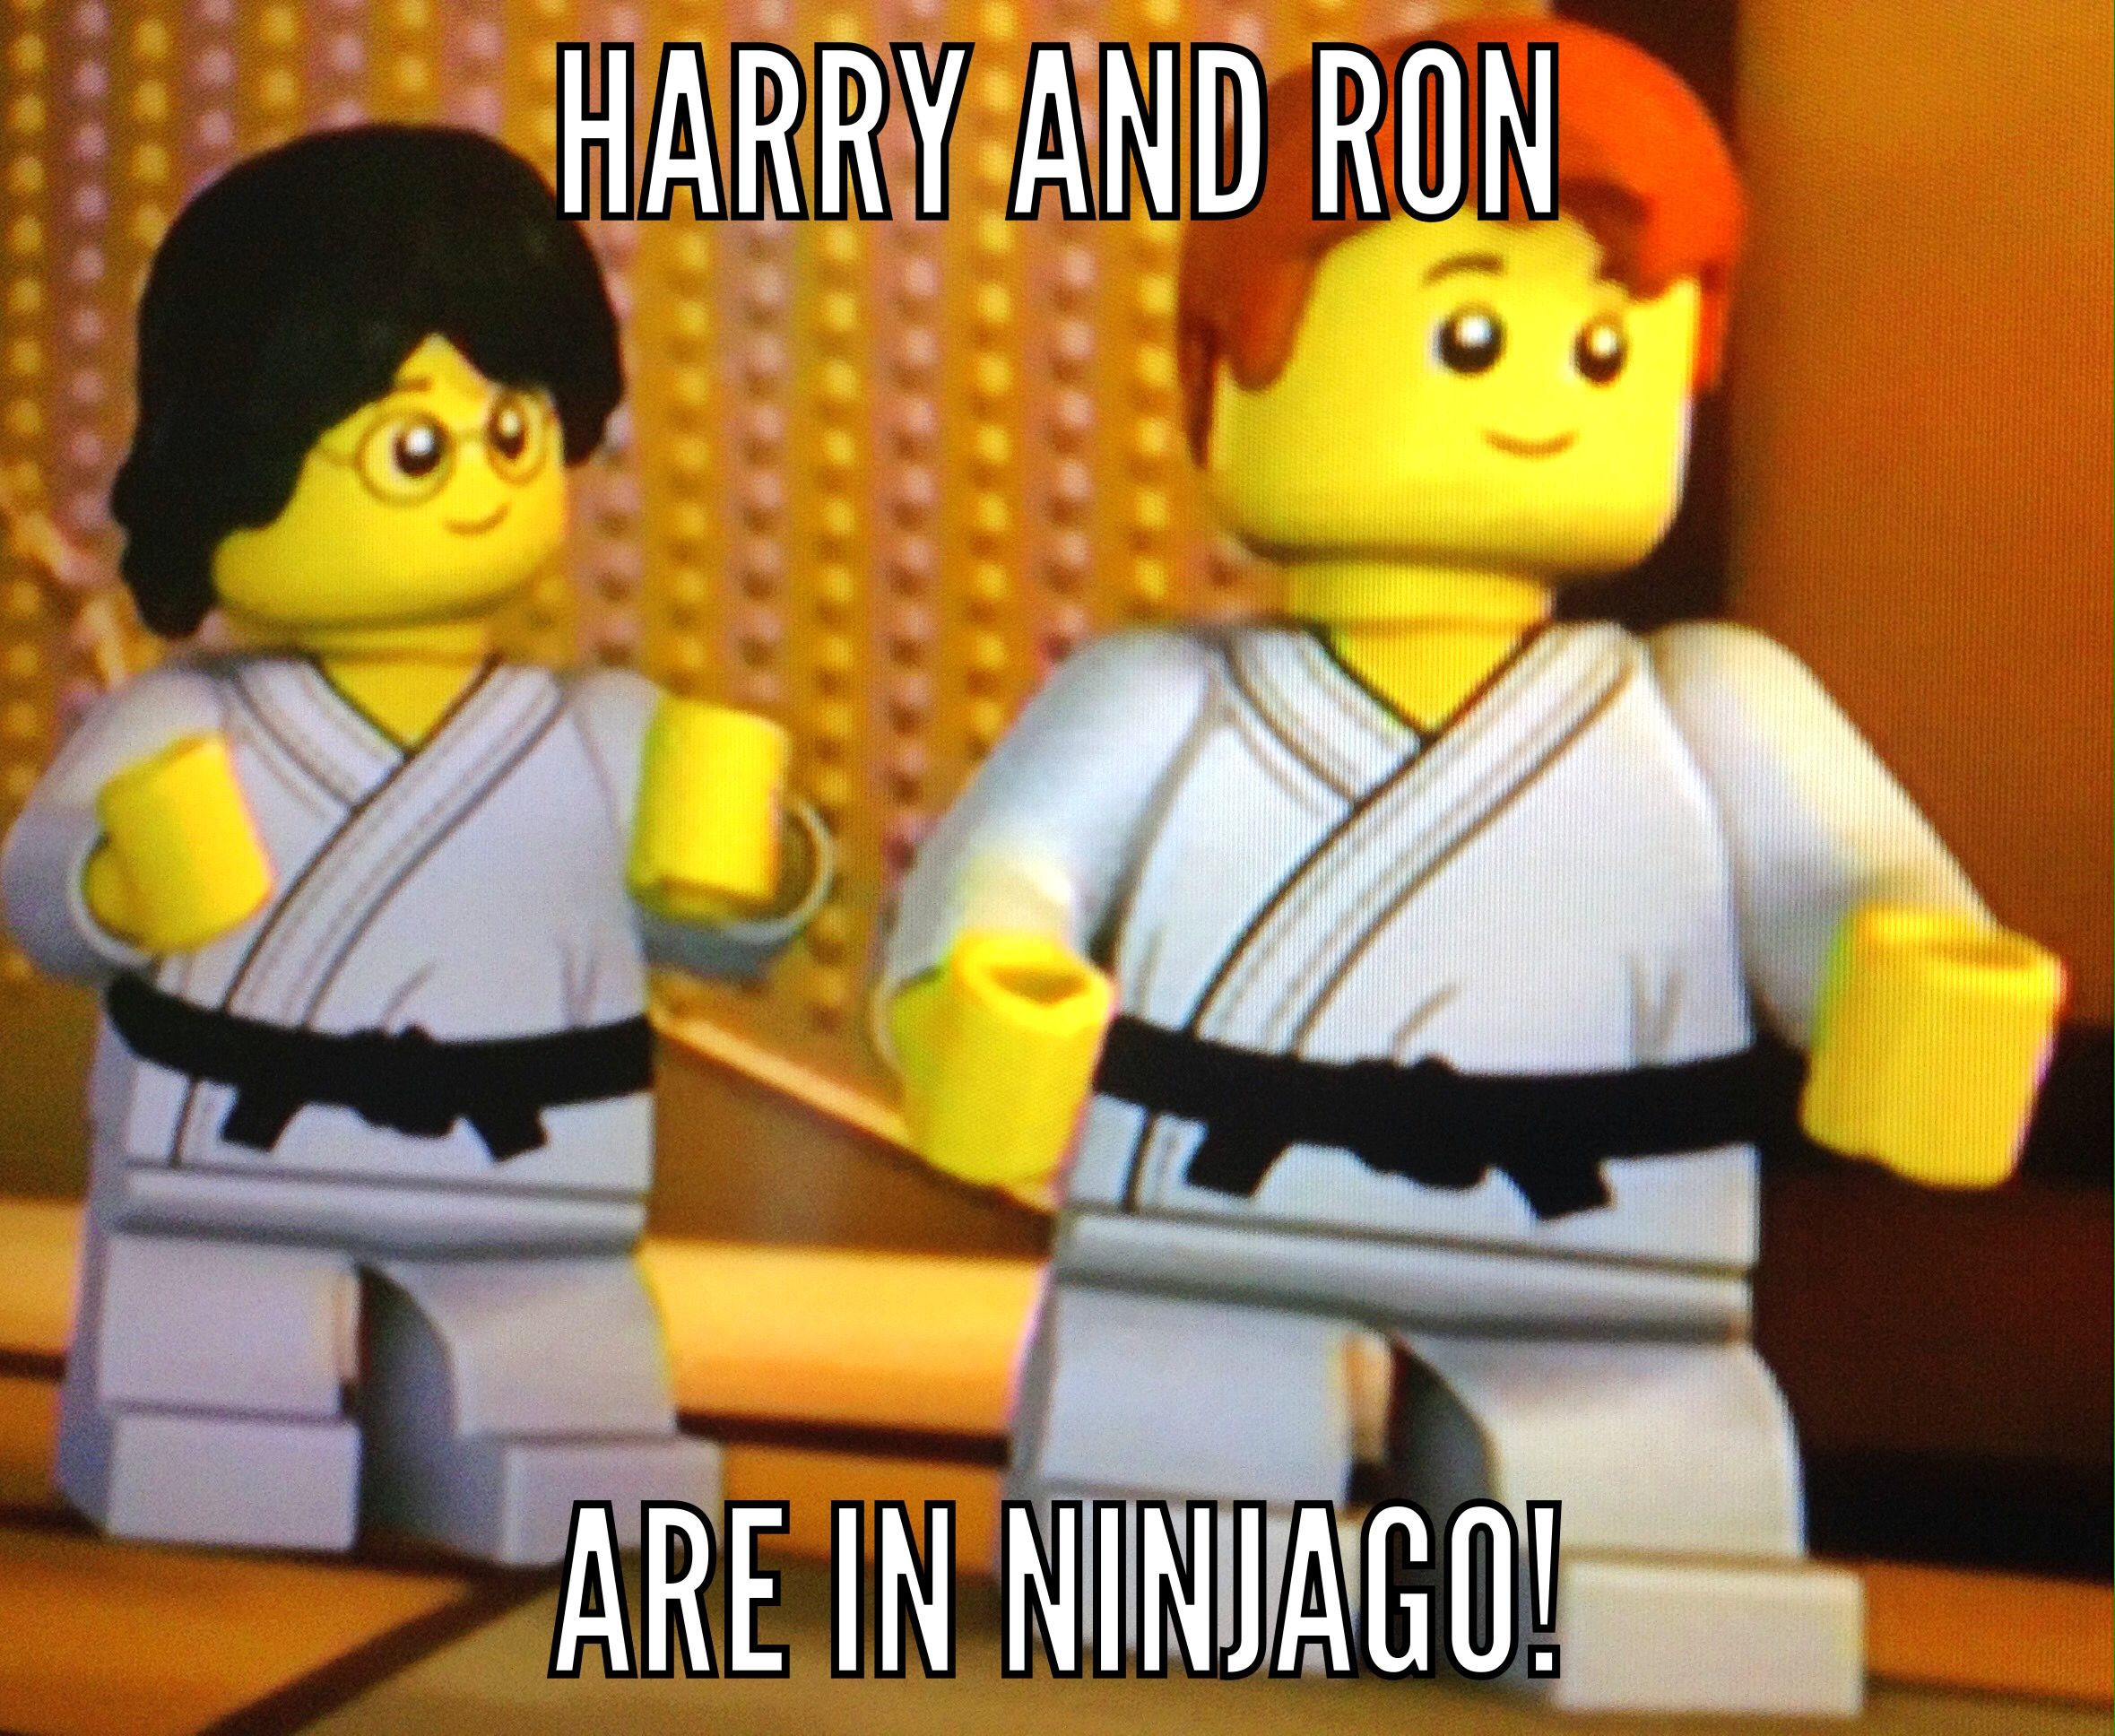 No Comment Ninjago Memes Harry Potter Funny Ninjago